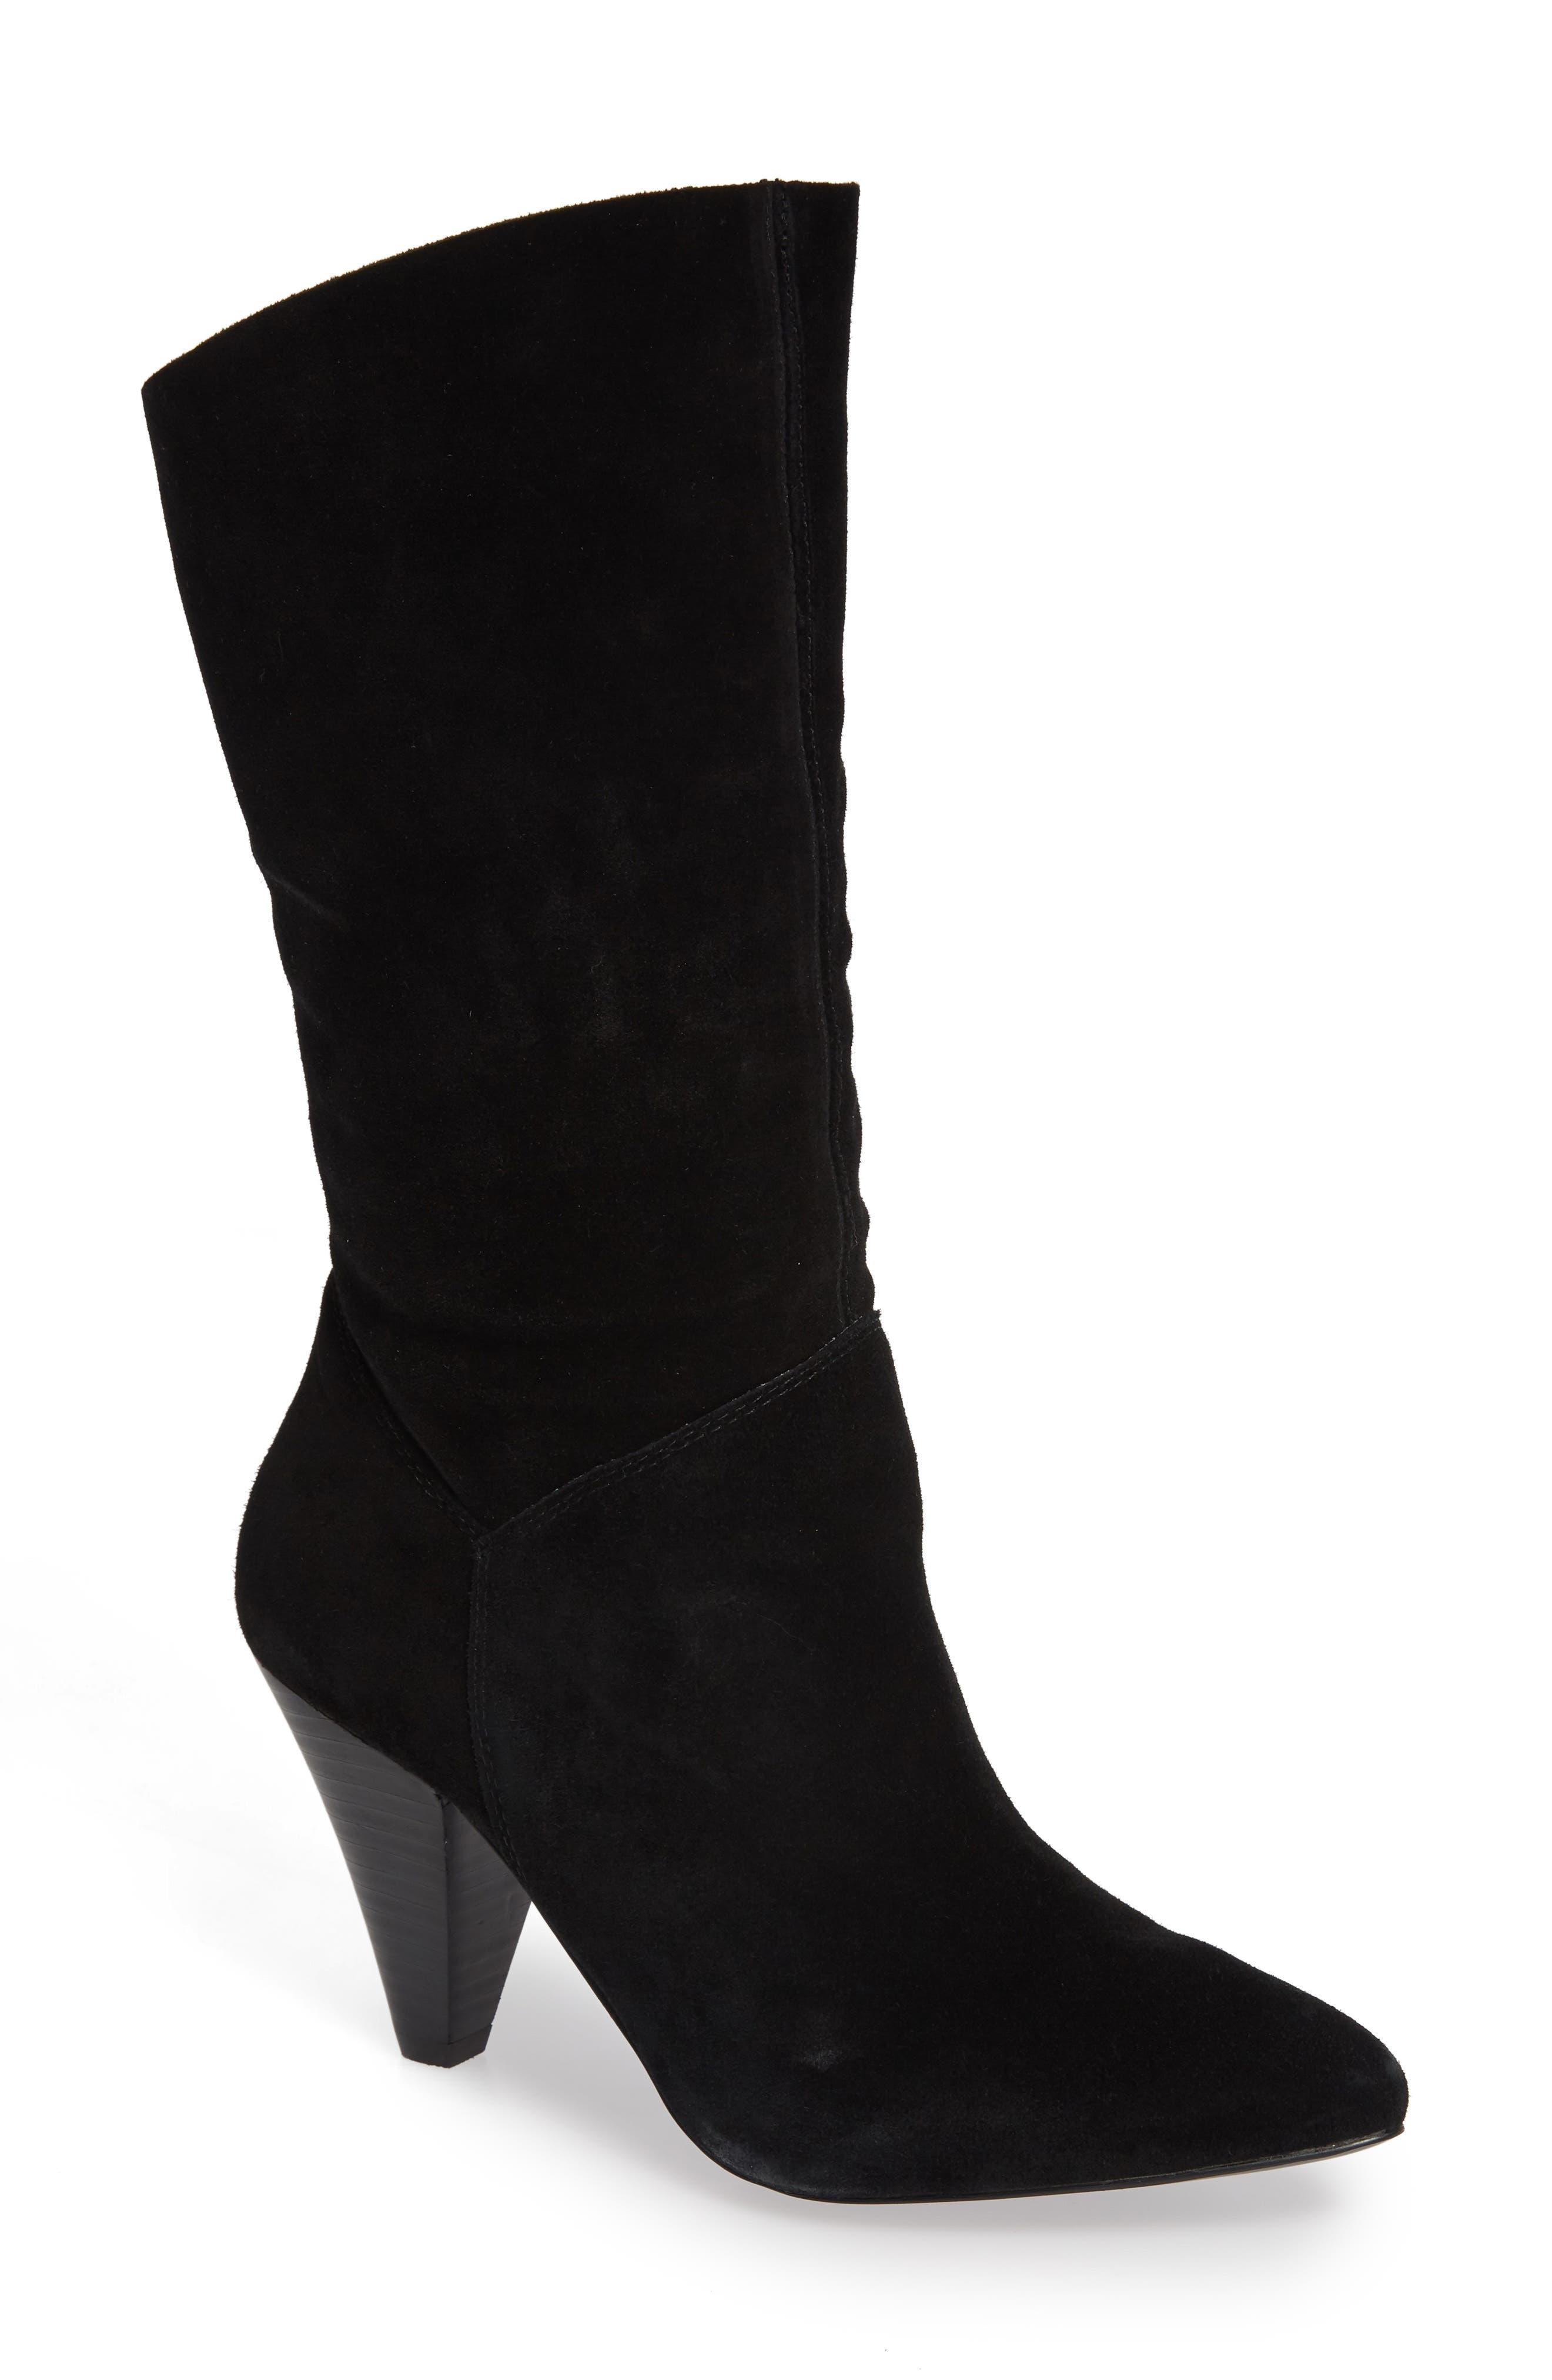 Rein Boot,                             Main thumbnail 1, color,                             BLACK SUEDE